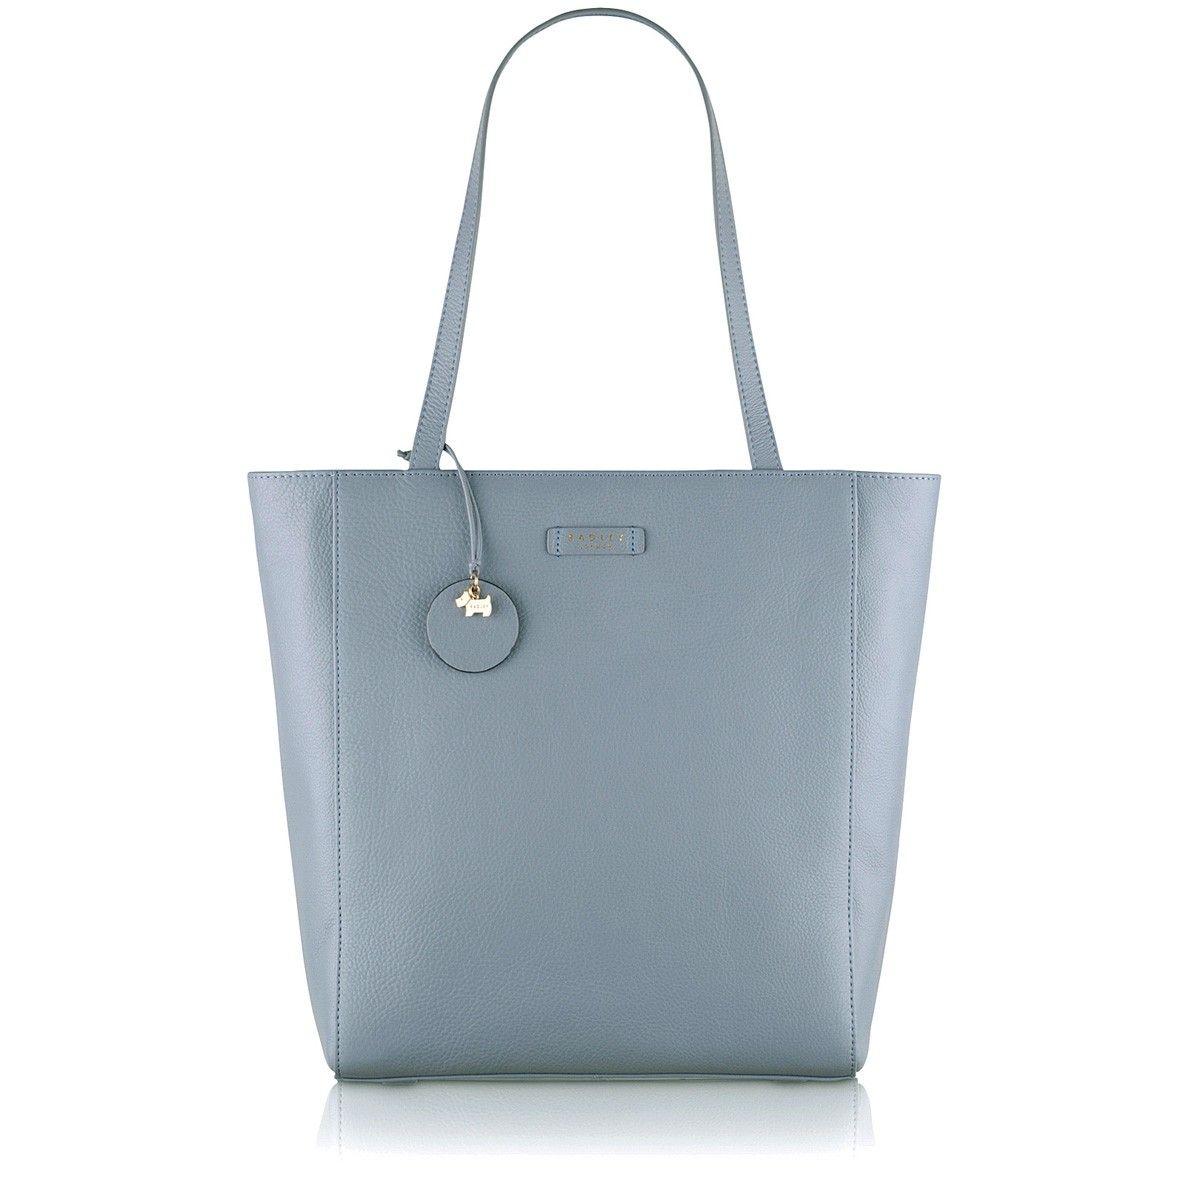 Radley Leather Tote Bag